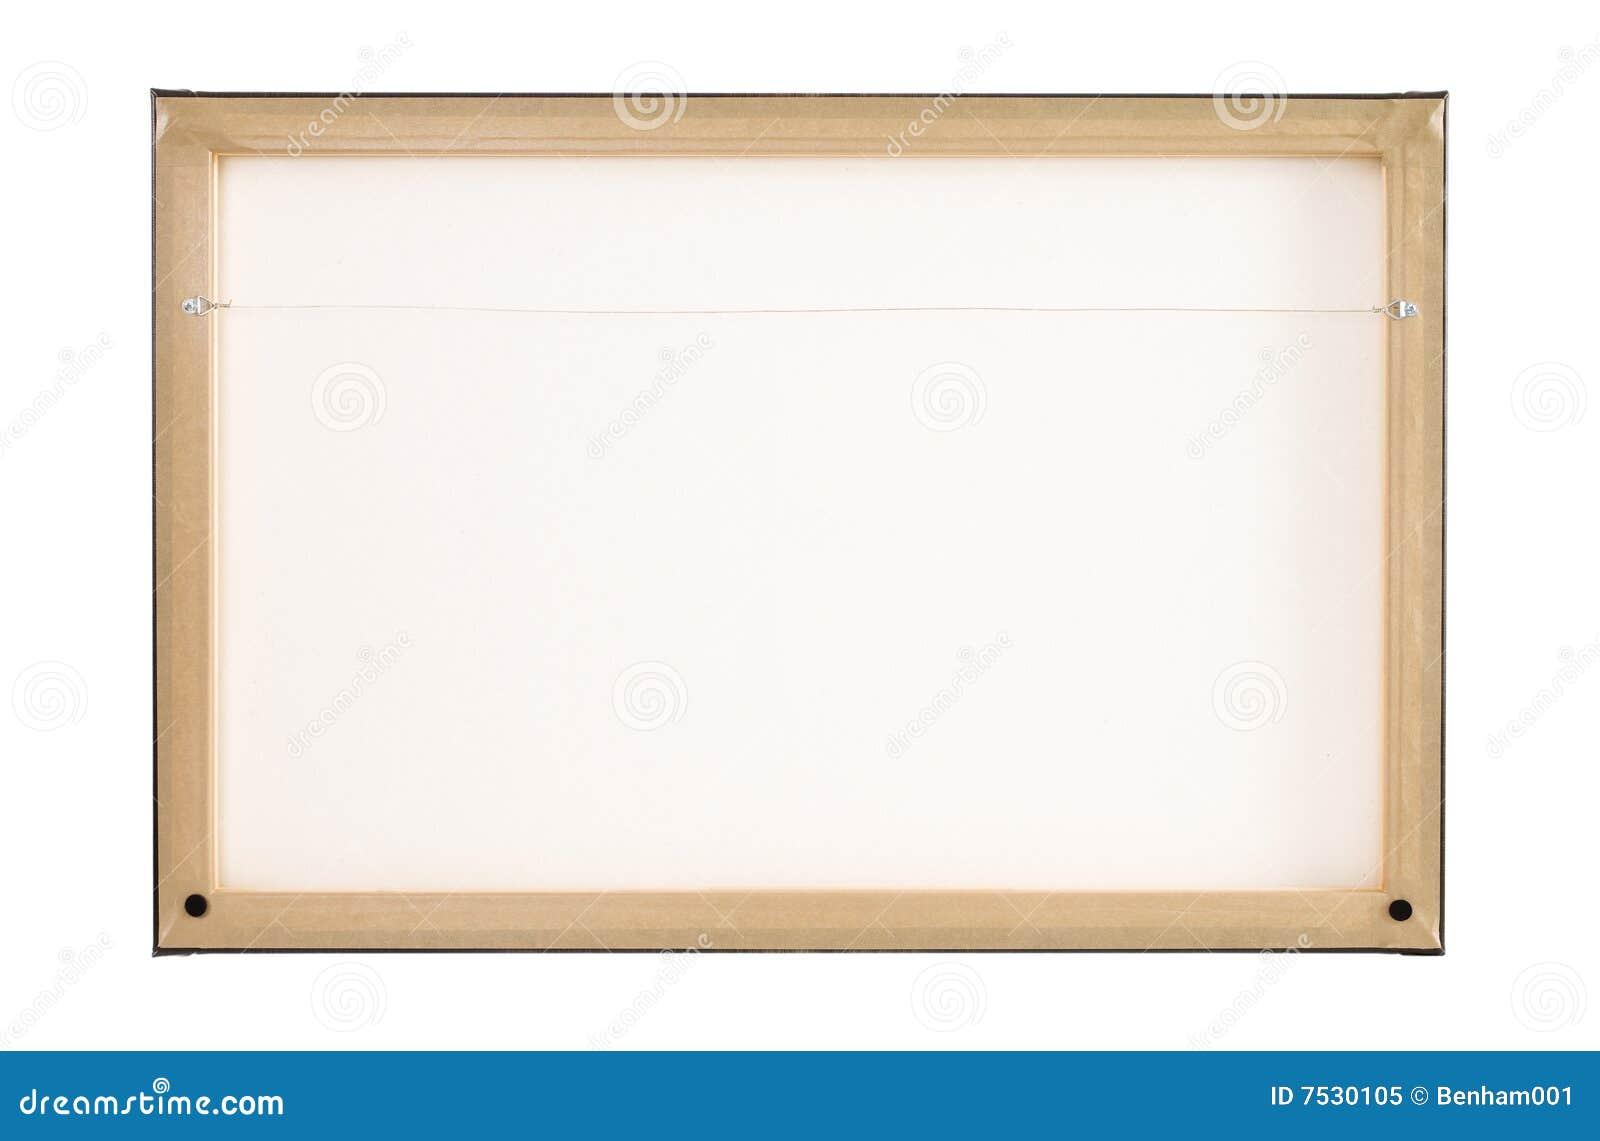 Stretched canvas detail stock image. Image of frame, inkjet - 7530105